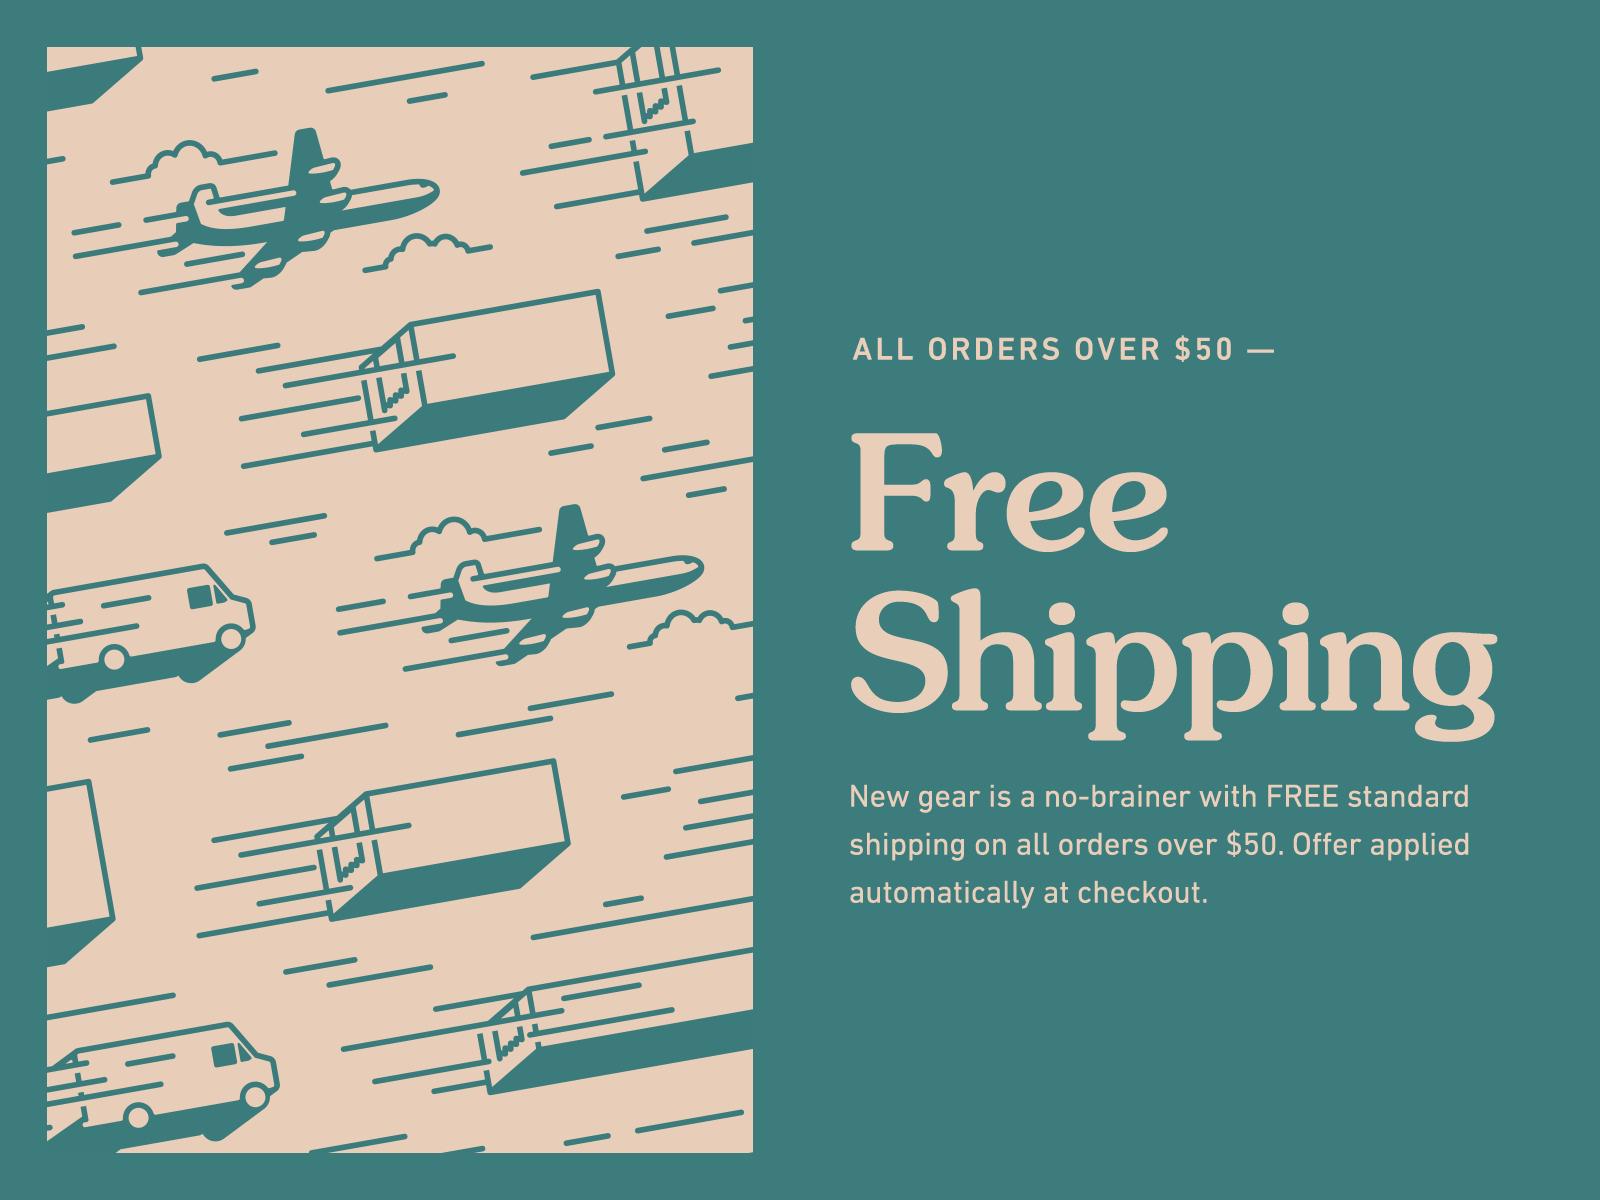 free-shipping-promo-1600.jpg